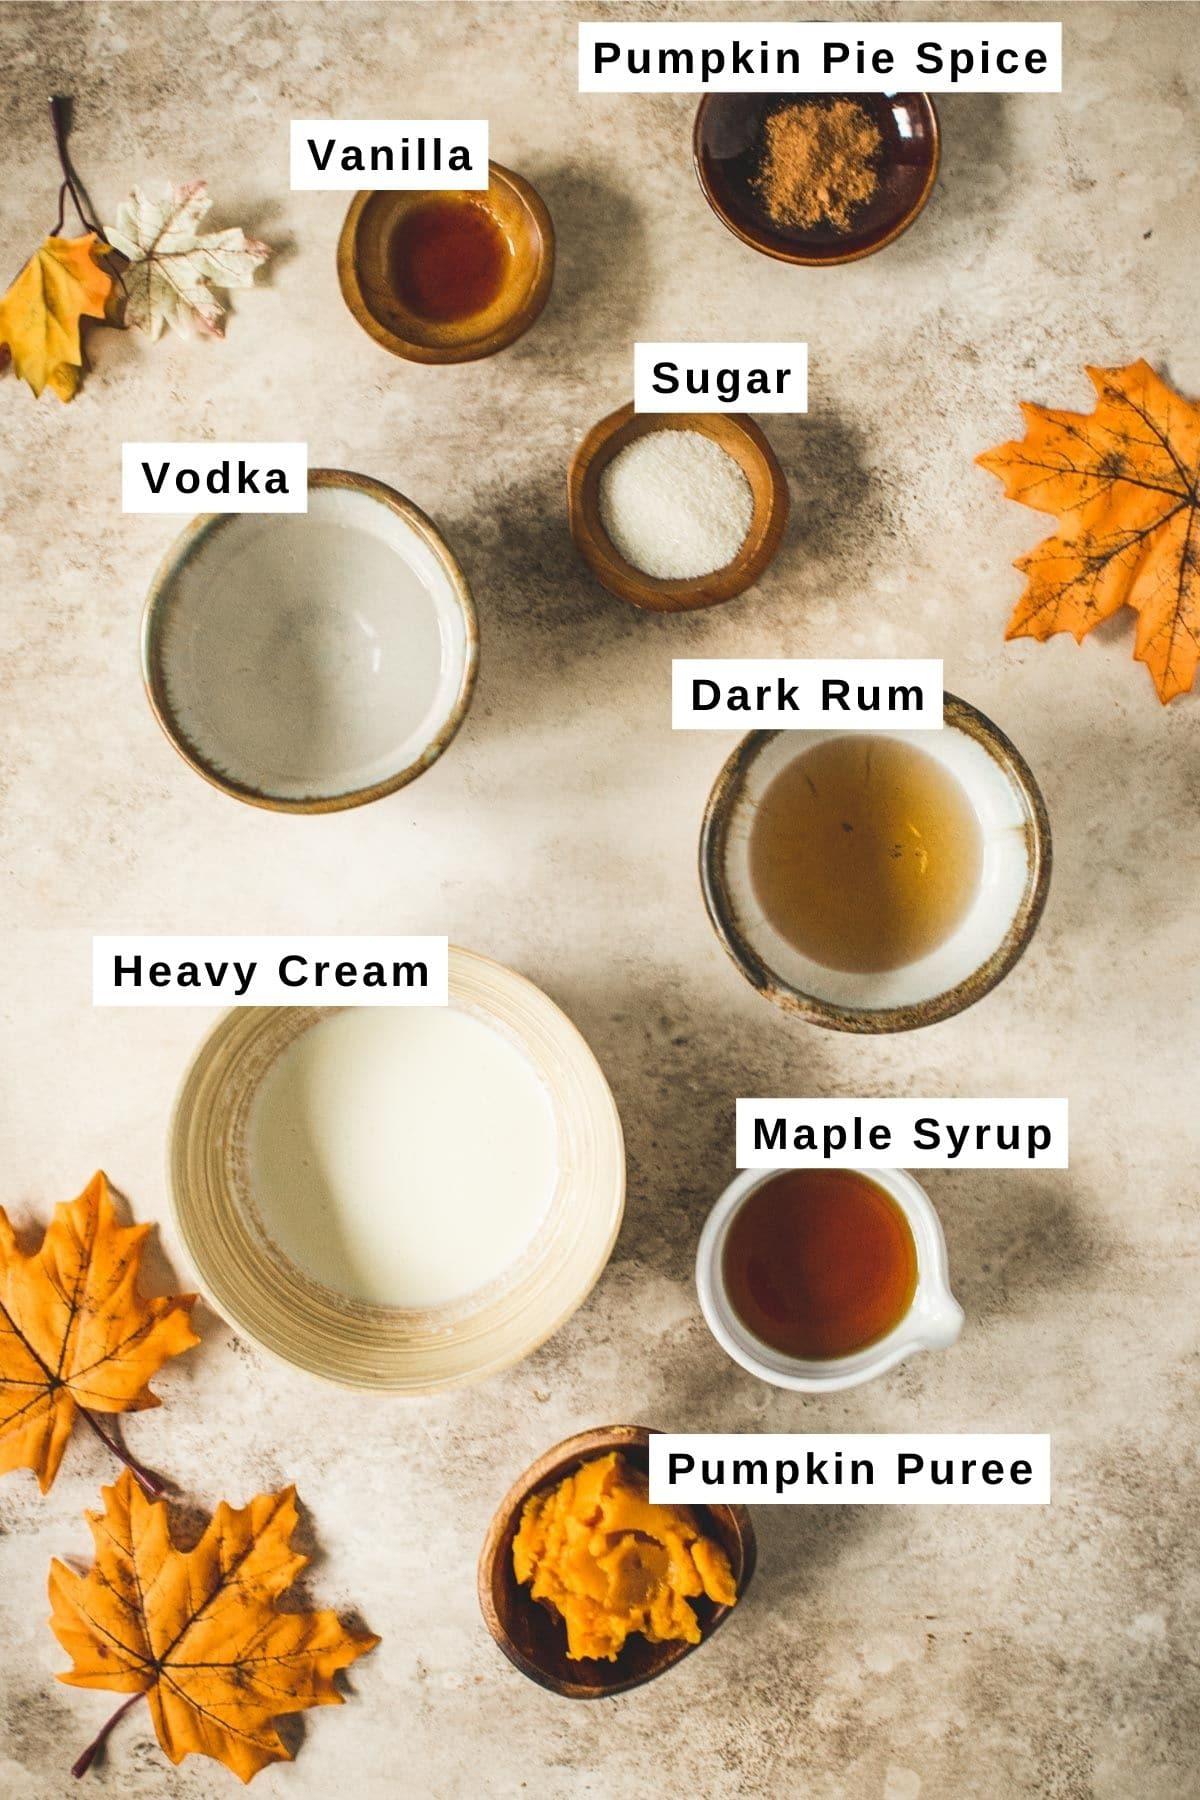 Pumpkin martini ingredients in various bowls.